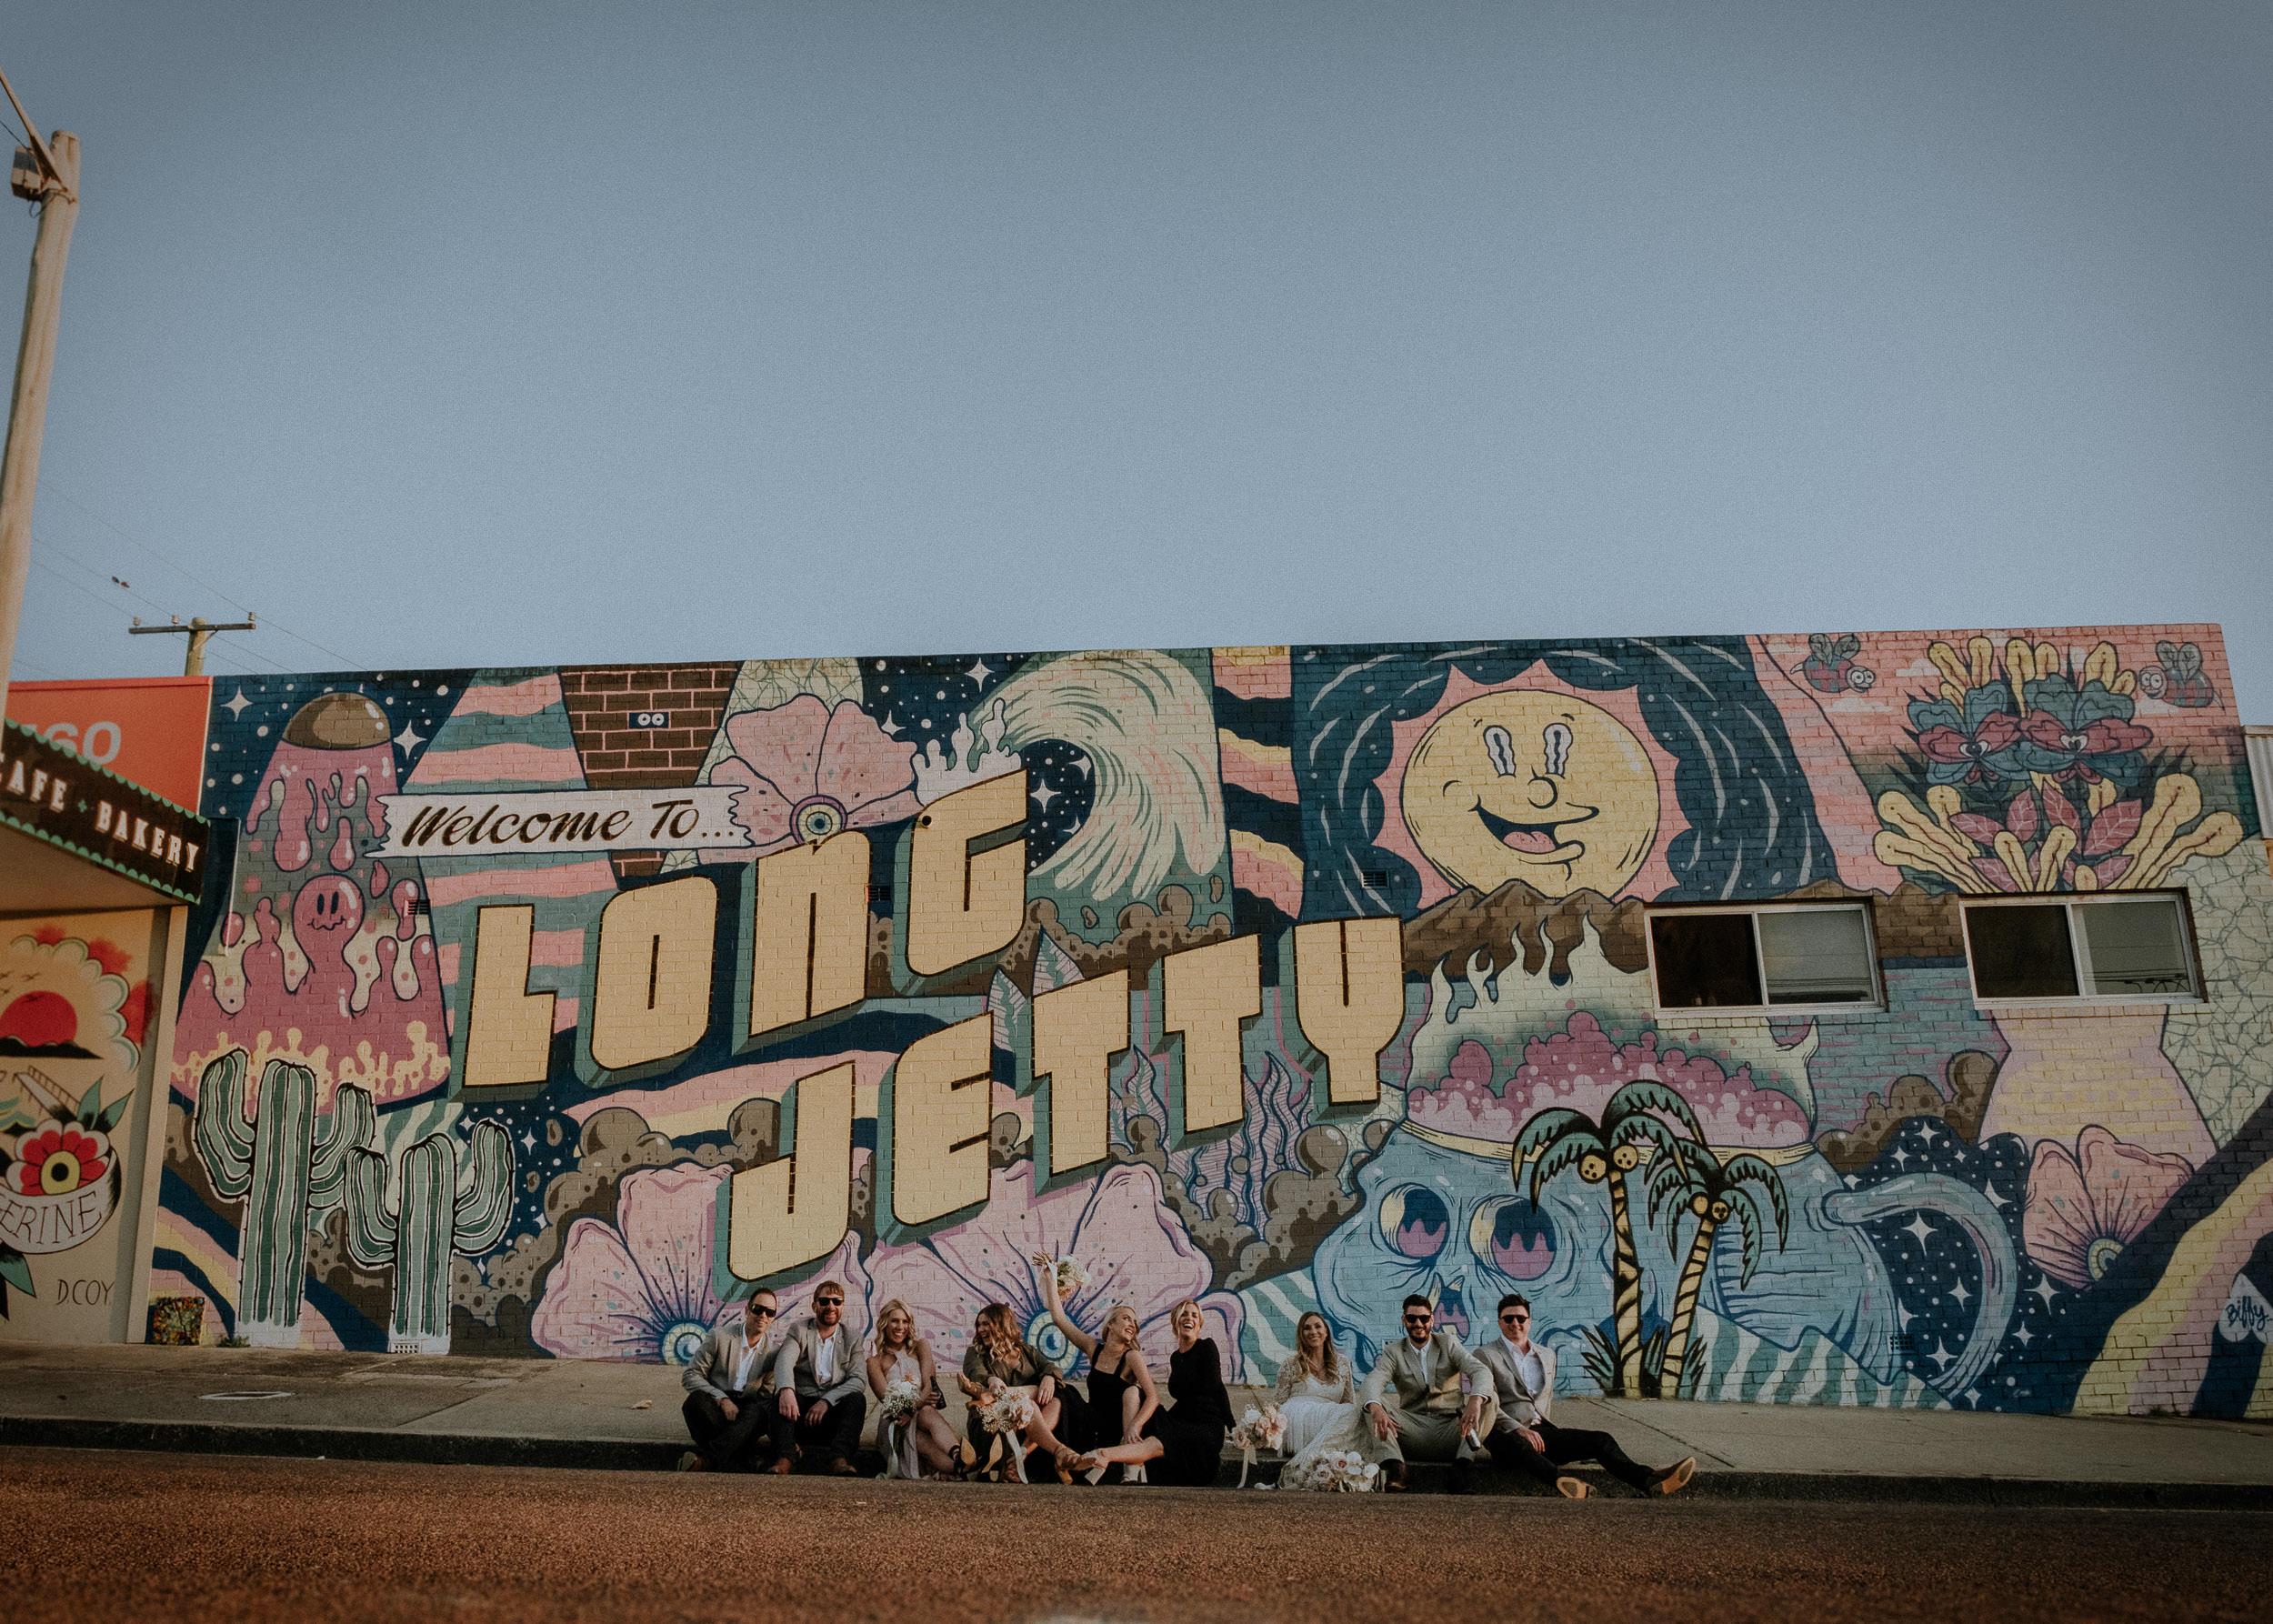 S&A Elopement - Kings & Thieves - Shred 'Til Dead - Central Coast Beach Forest Wedding - 363.jpg